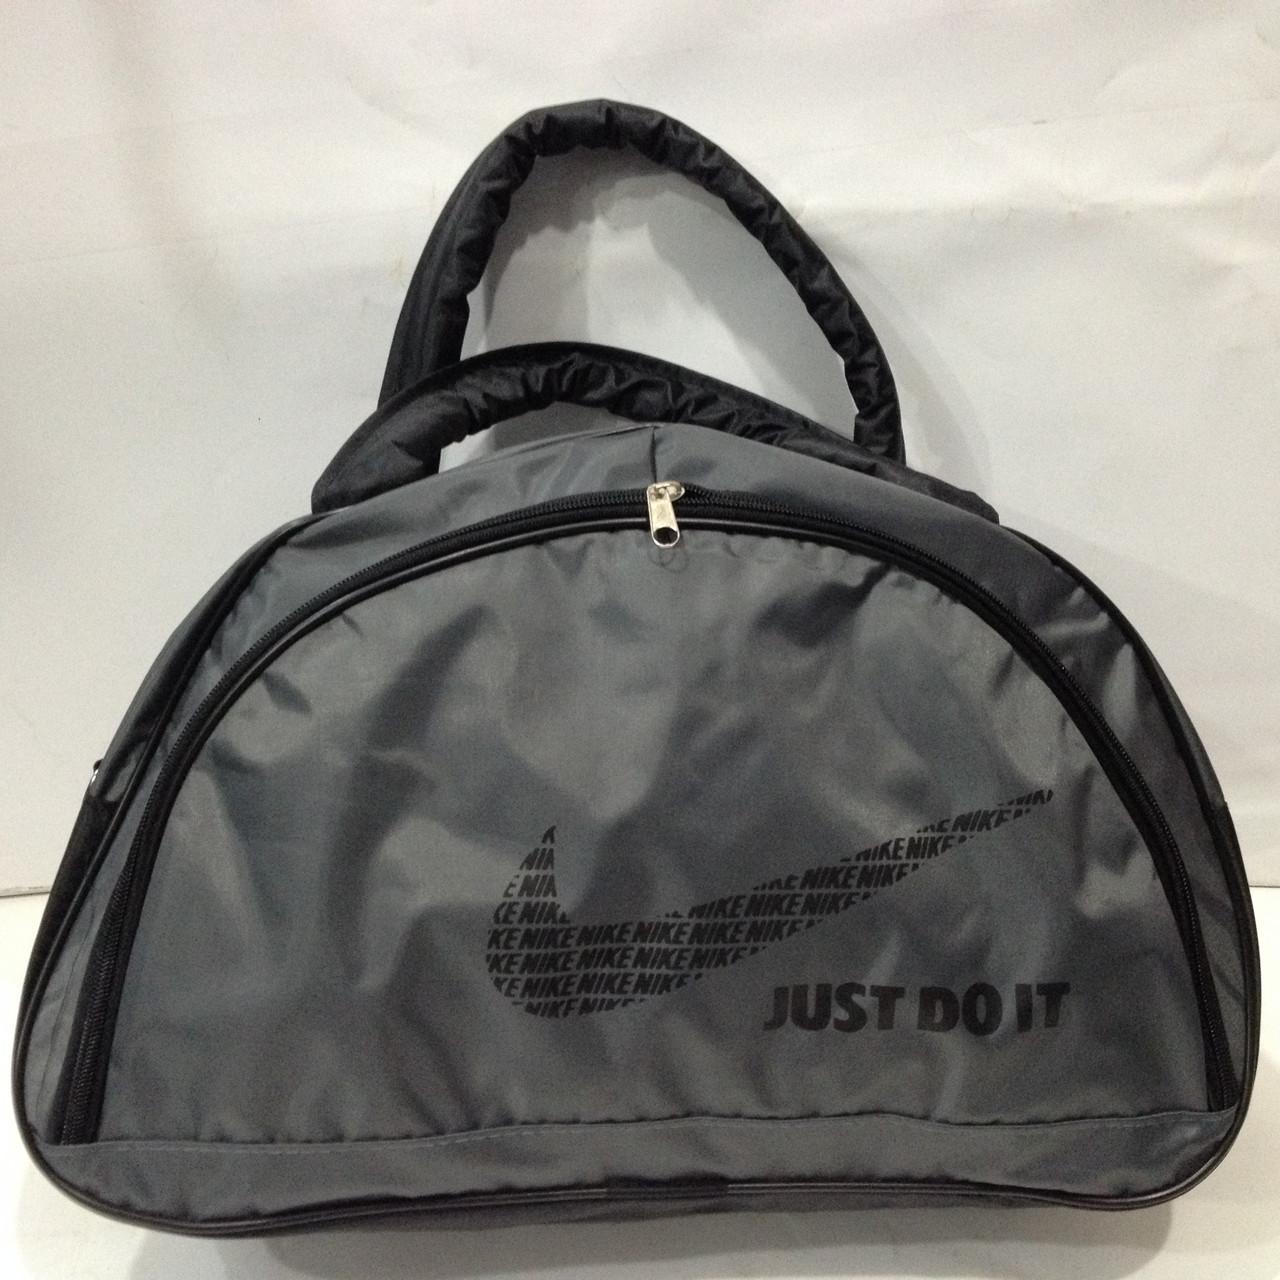 a2485352f3ec Спортивная сумка для фитнеса Nike оптом : продажа, цена в Харькове ...